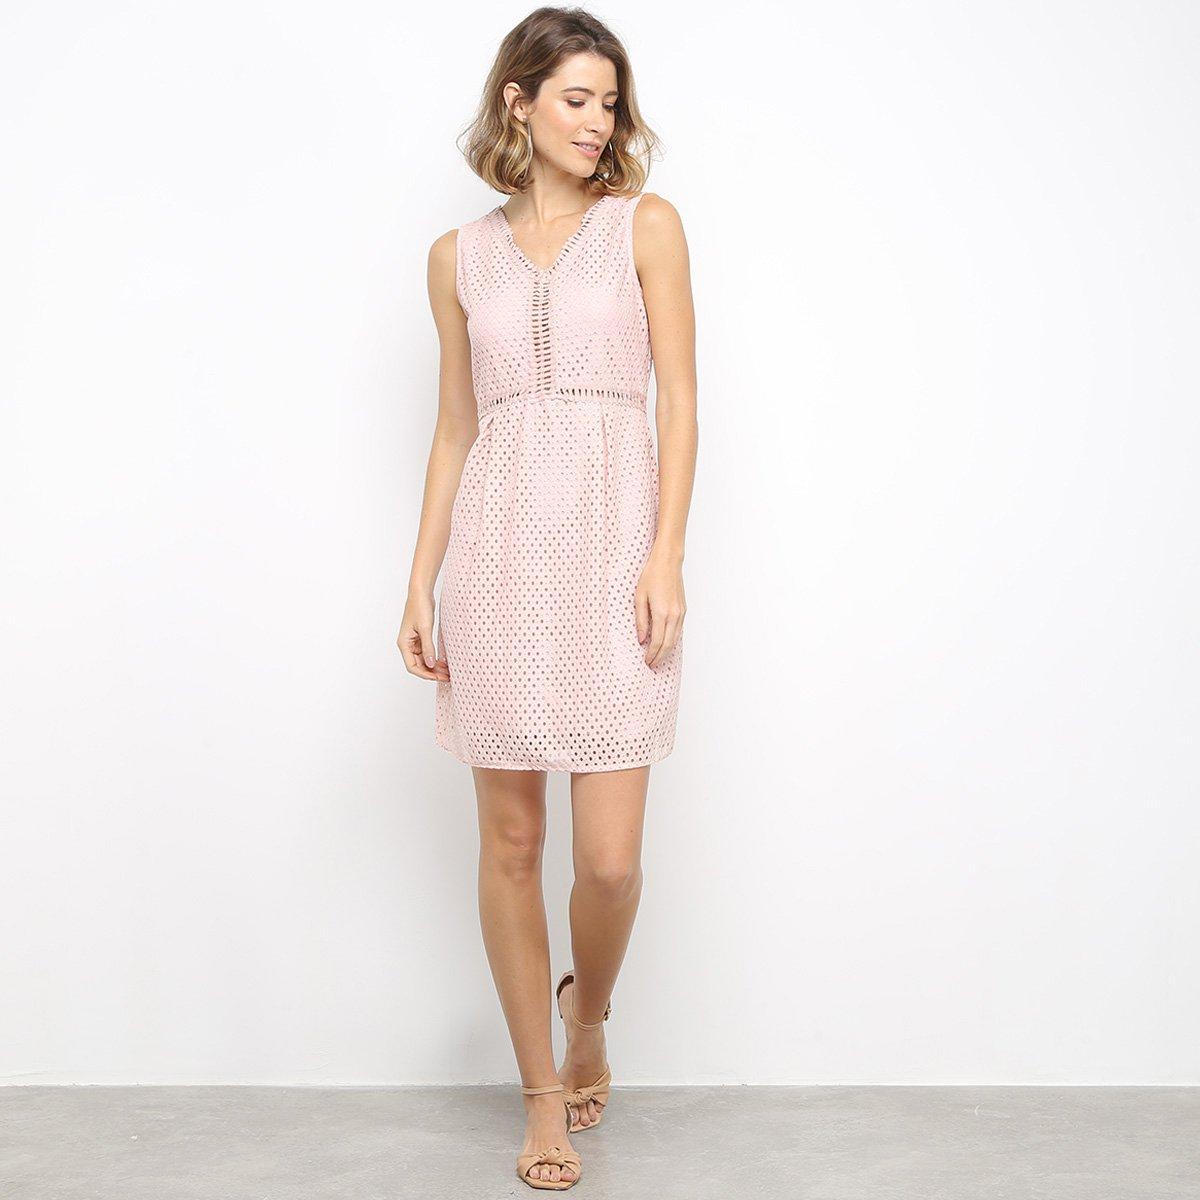 Vestido Pérola Curto Com Renda - Rosa